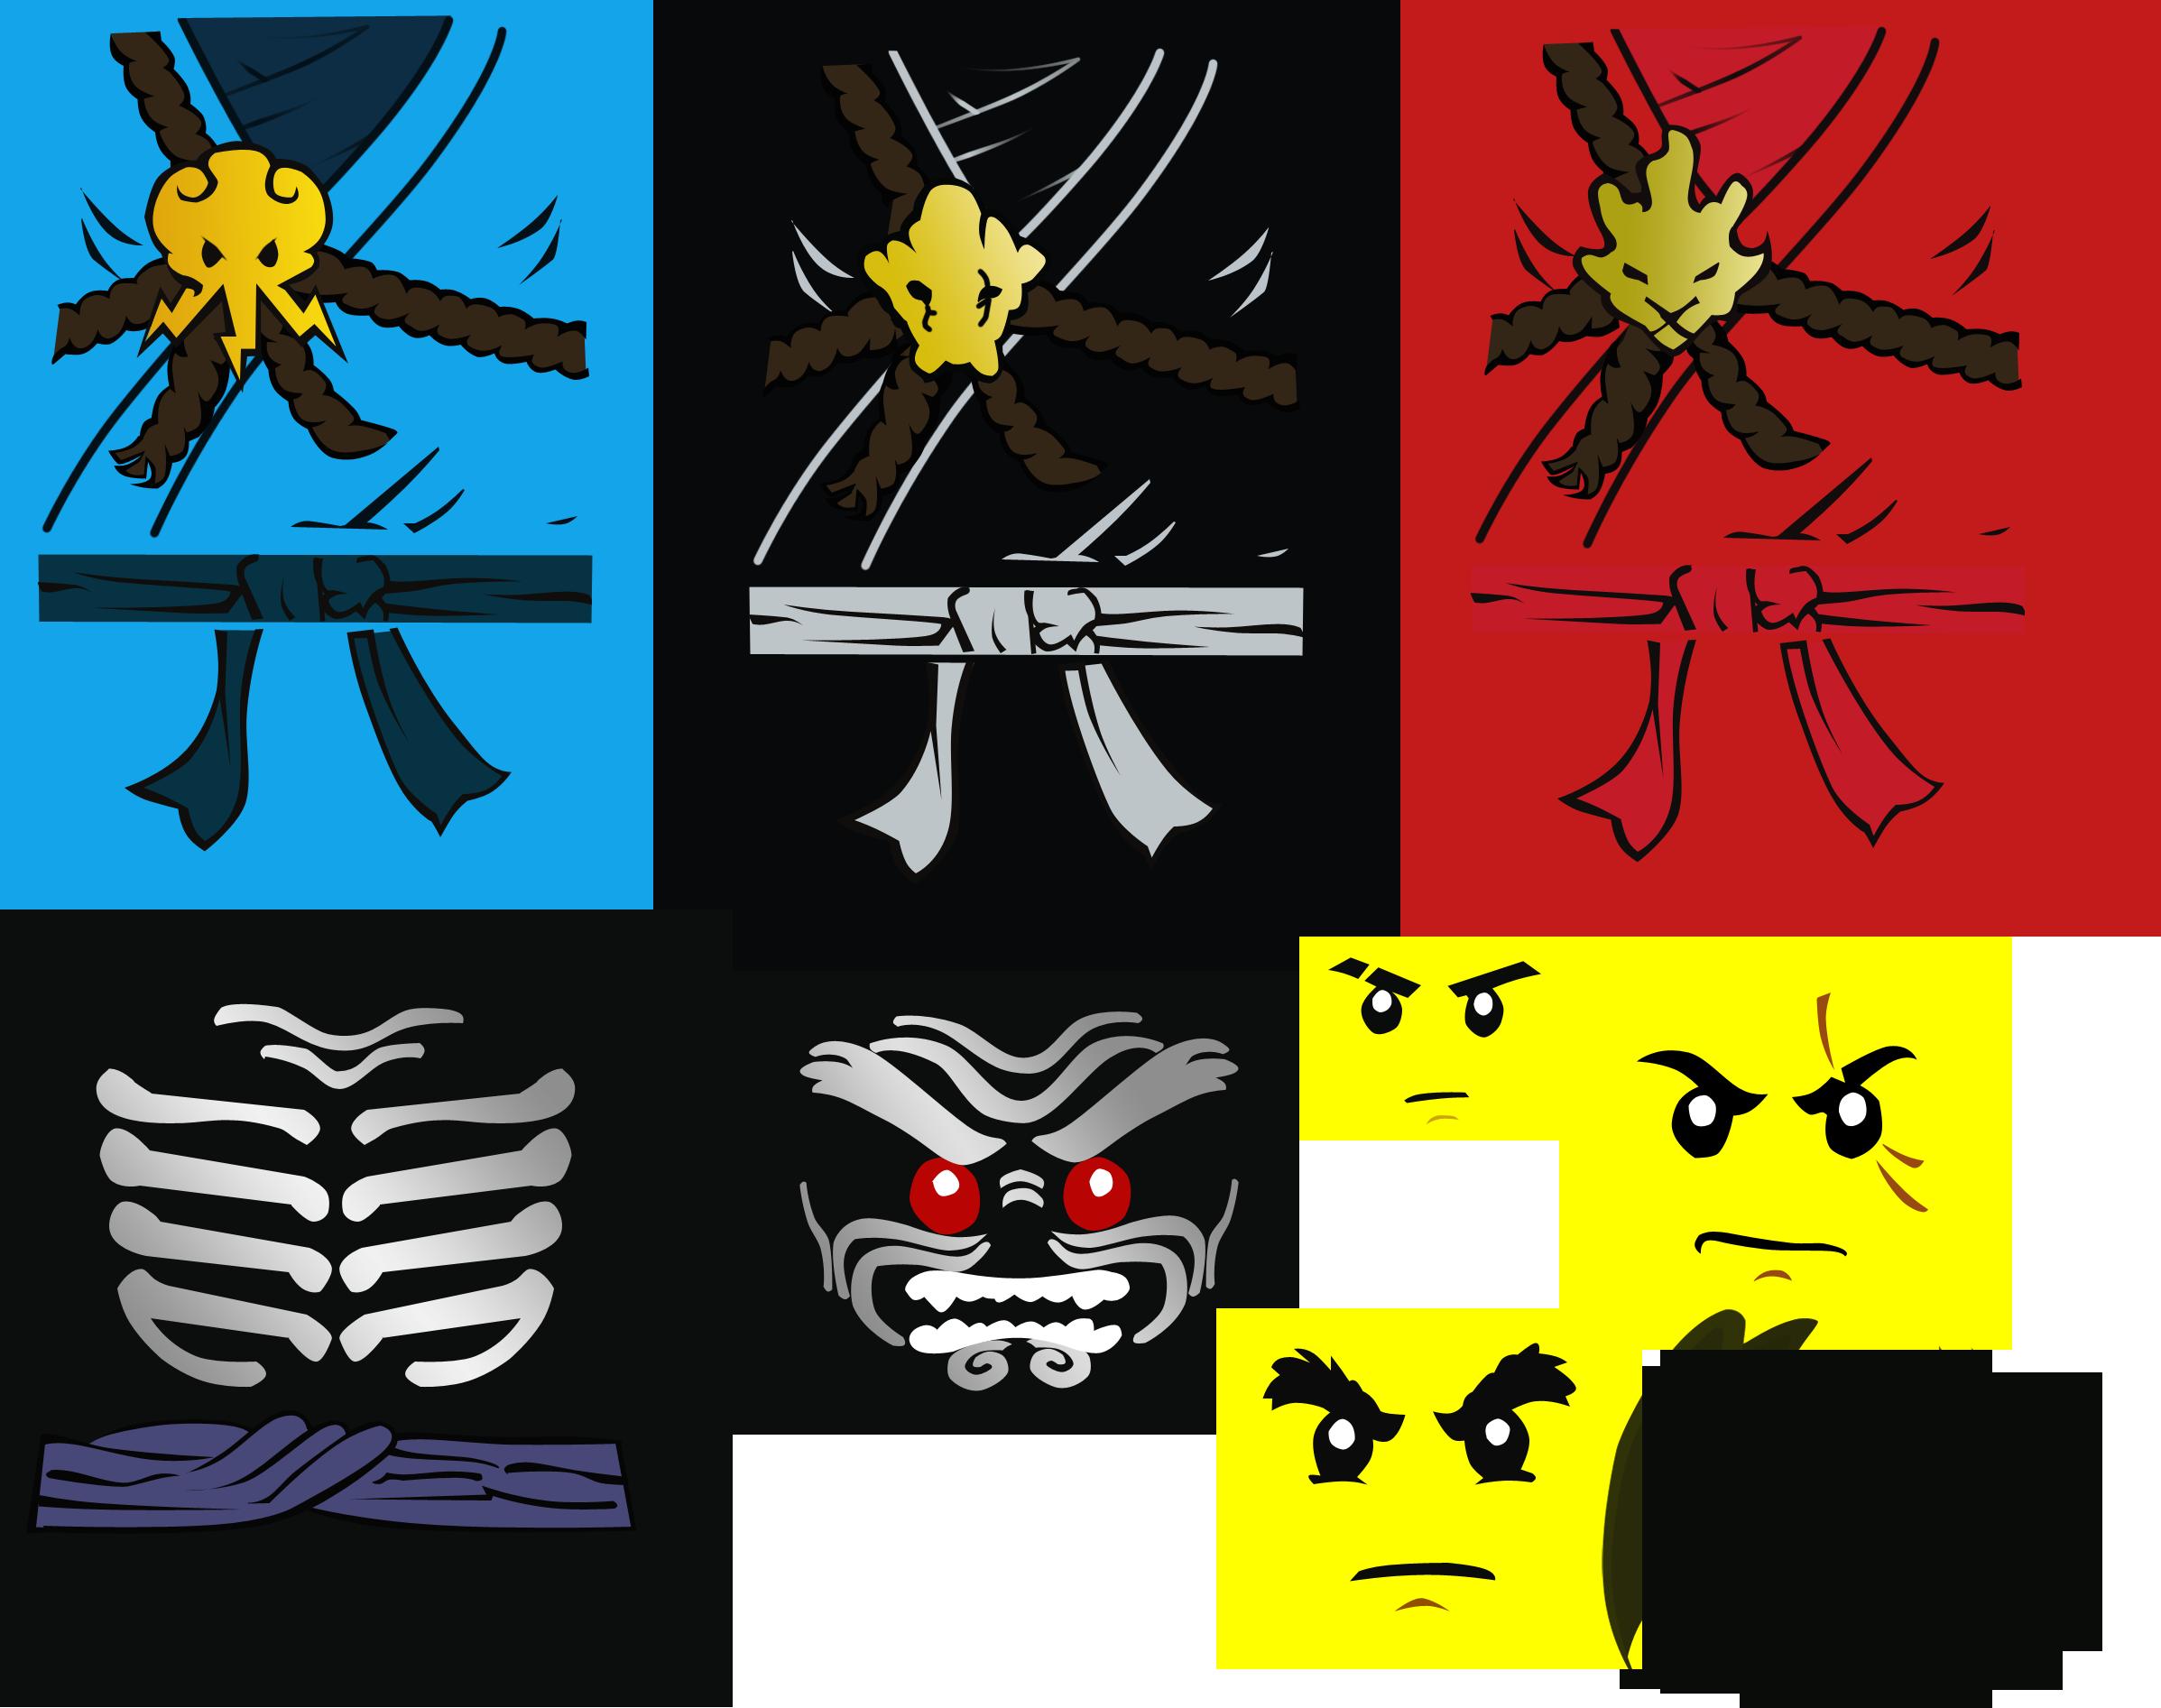 Lego ninjago textures gikairangames - Lego ninjago logo ...